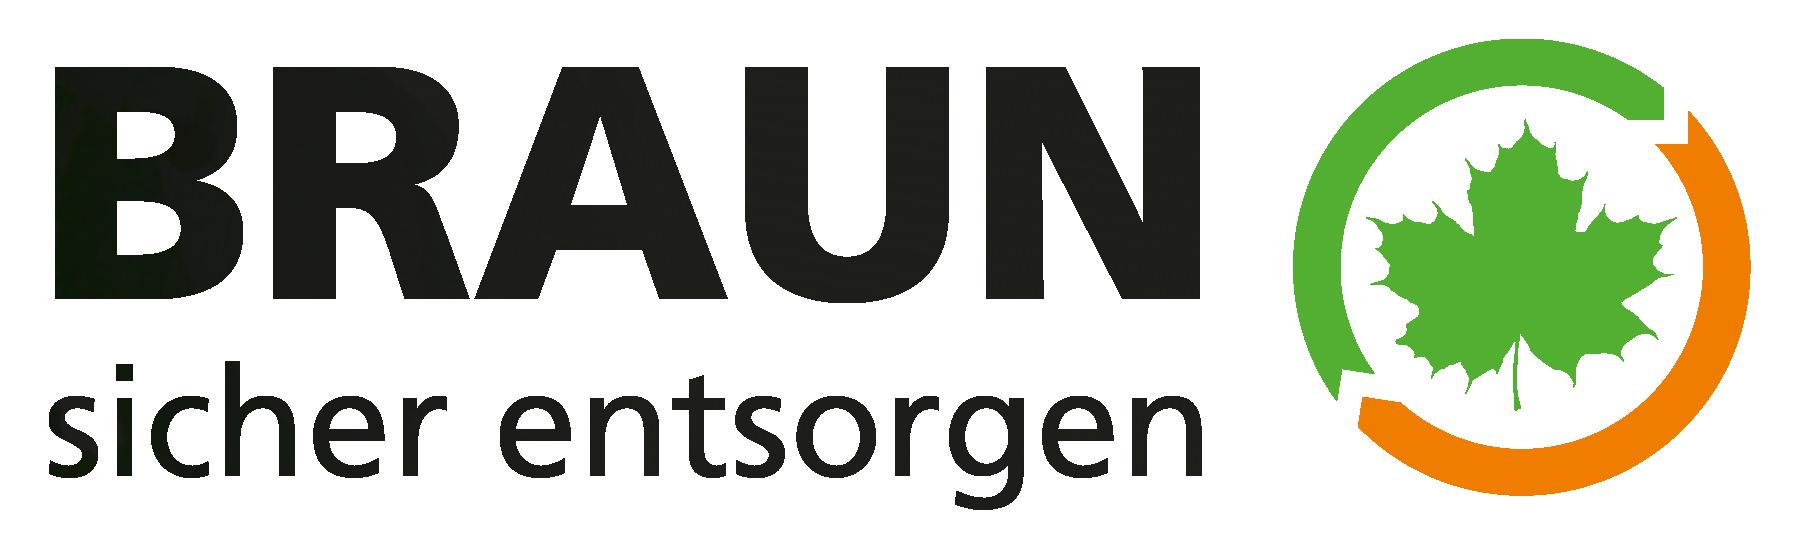 BRAUN Entsorgung GmbH - Büro